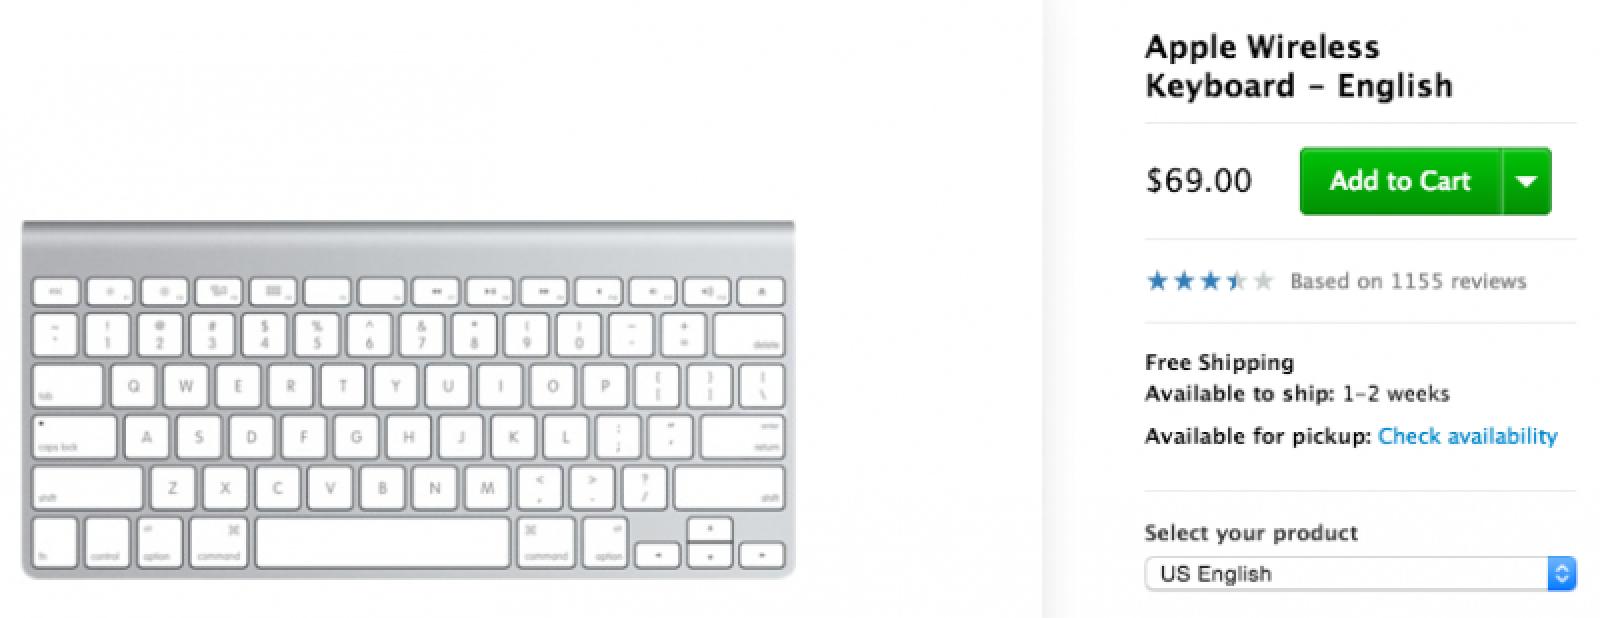 apple wireless keyboard now ships in 1 2 weeks new backlit model possible mac rumors. Black Bedroom Furniture Sets. Home Design Ideas